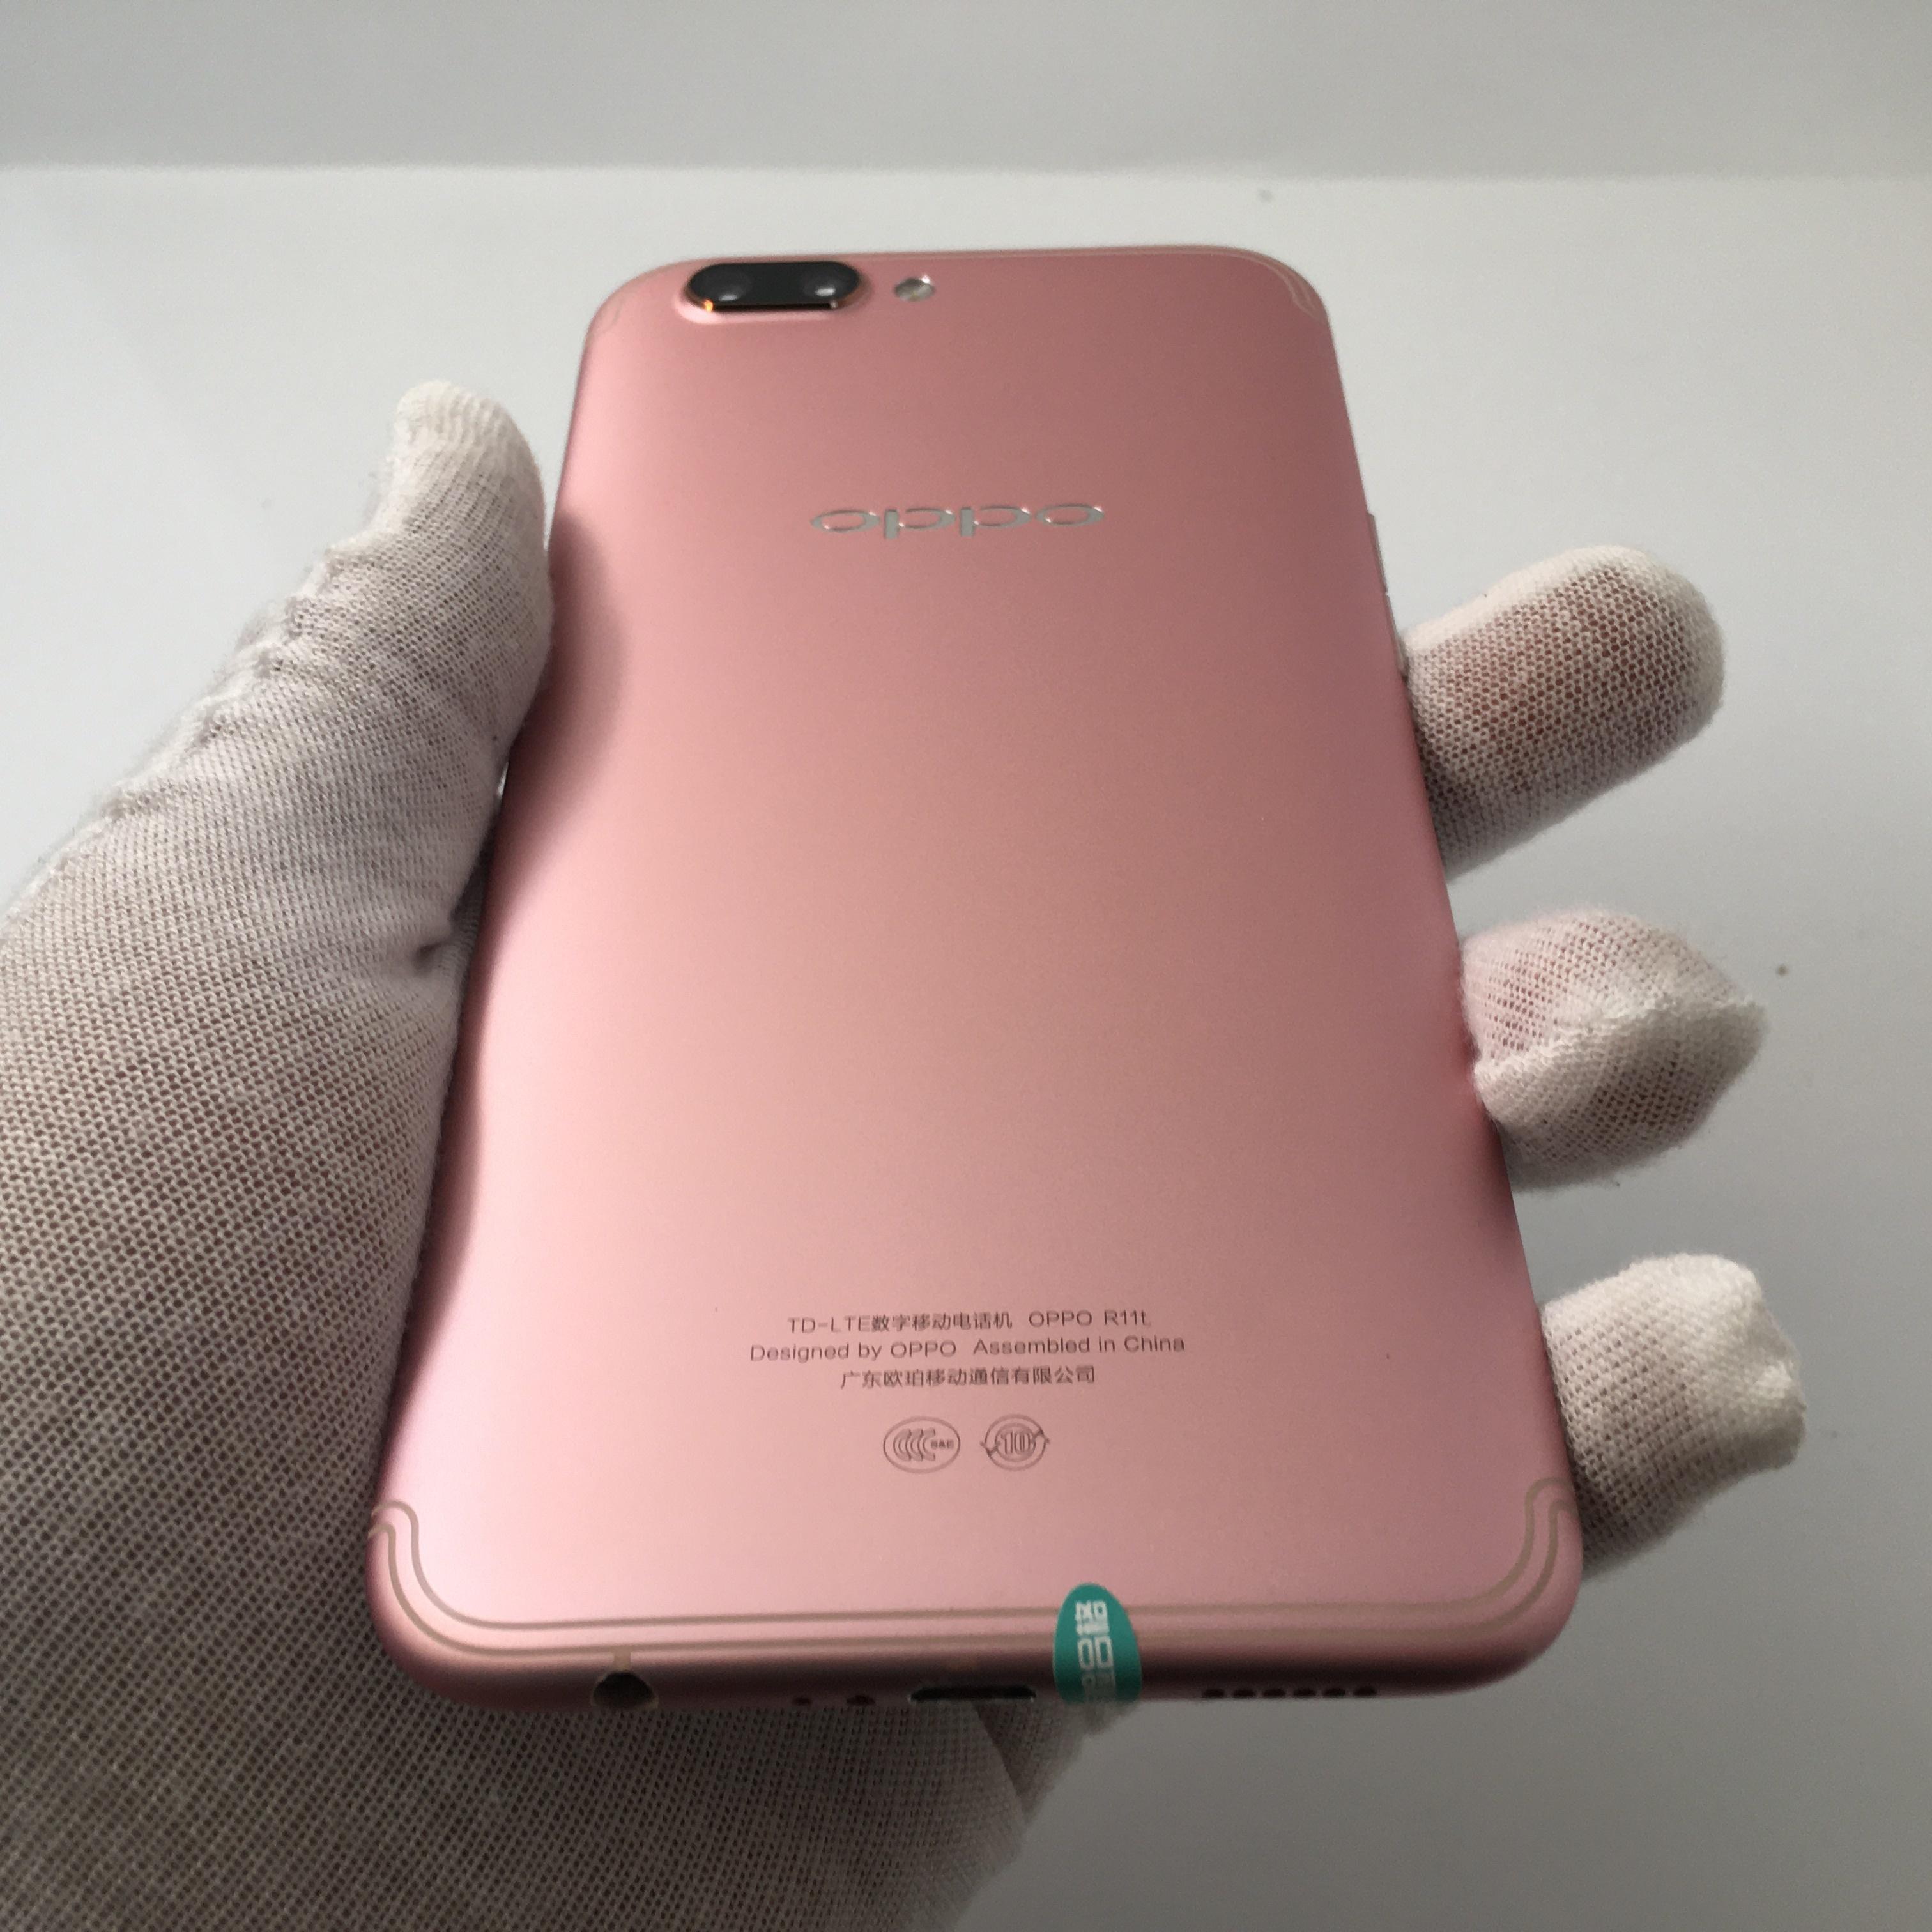 oppo【R11】移动 4G/3G/2G 玫瑰金 4G/64G 国行 99新